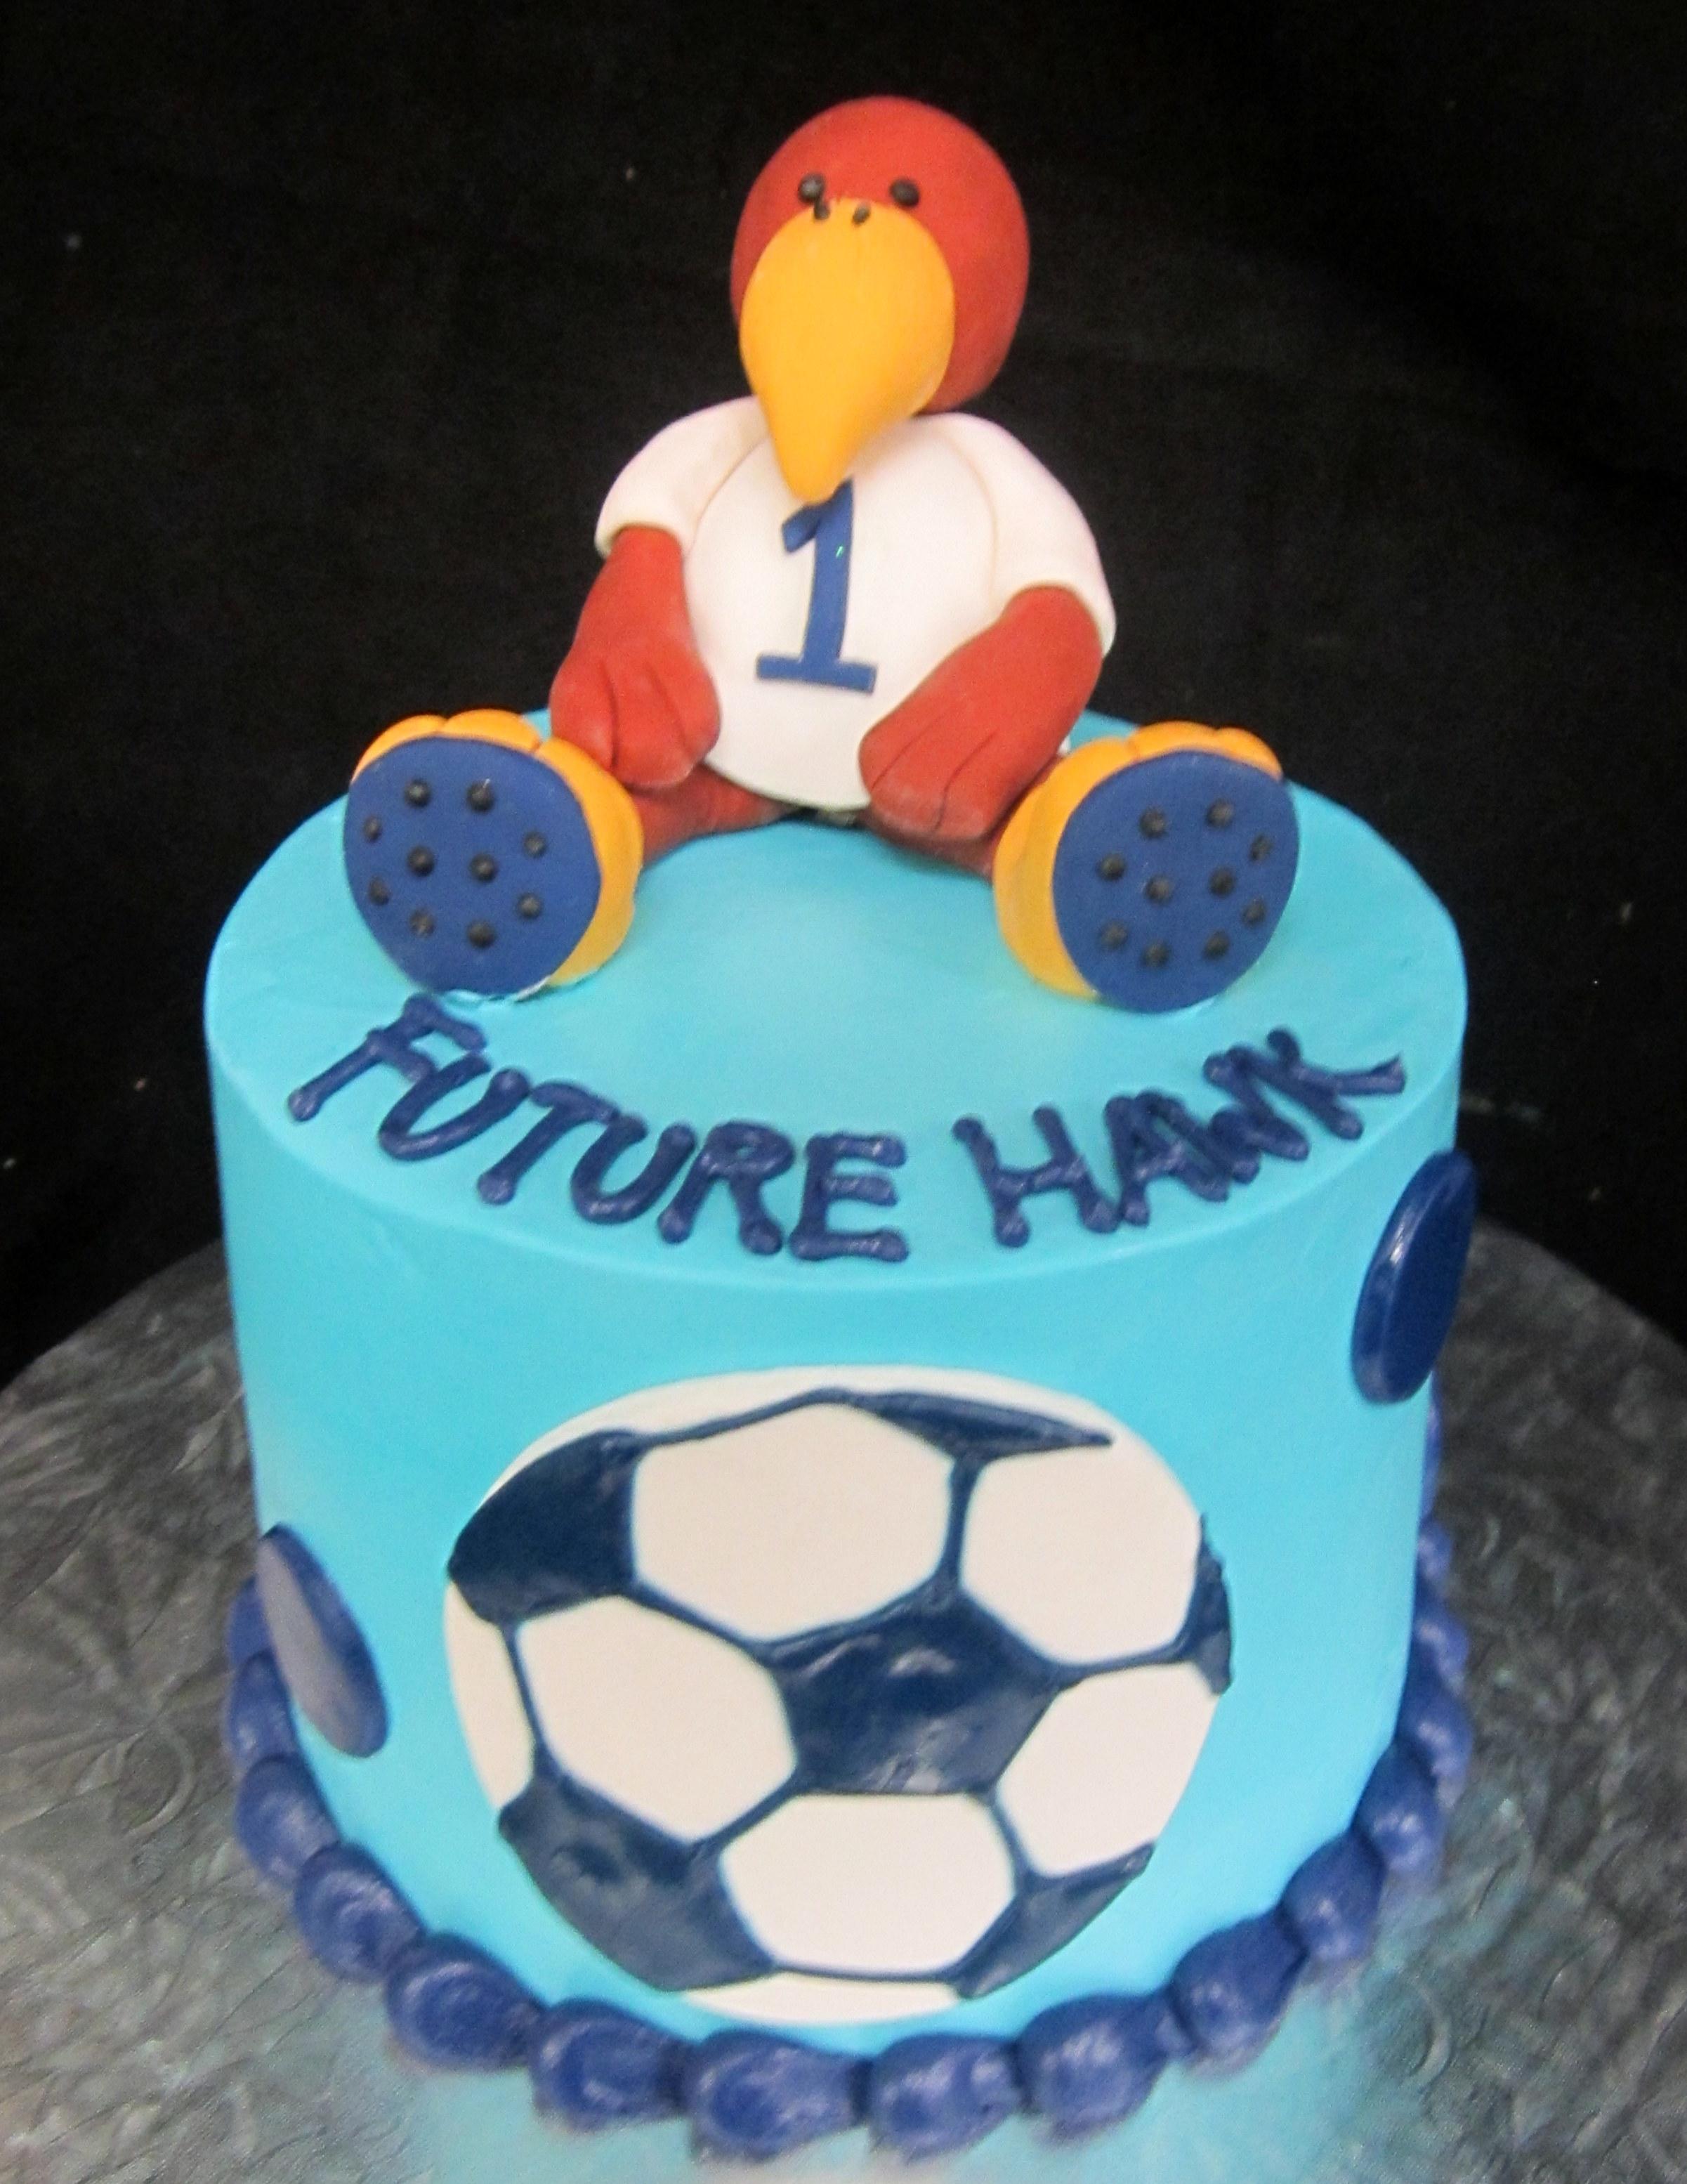 jay hawk figure with soccer ball.jpg